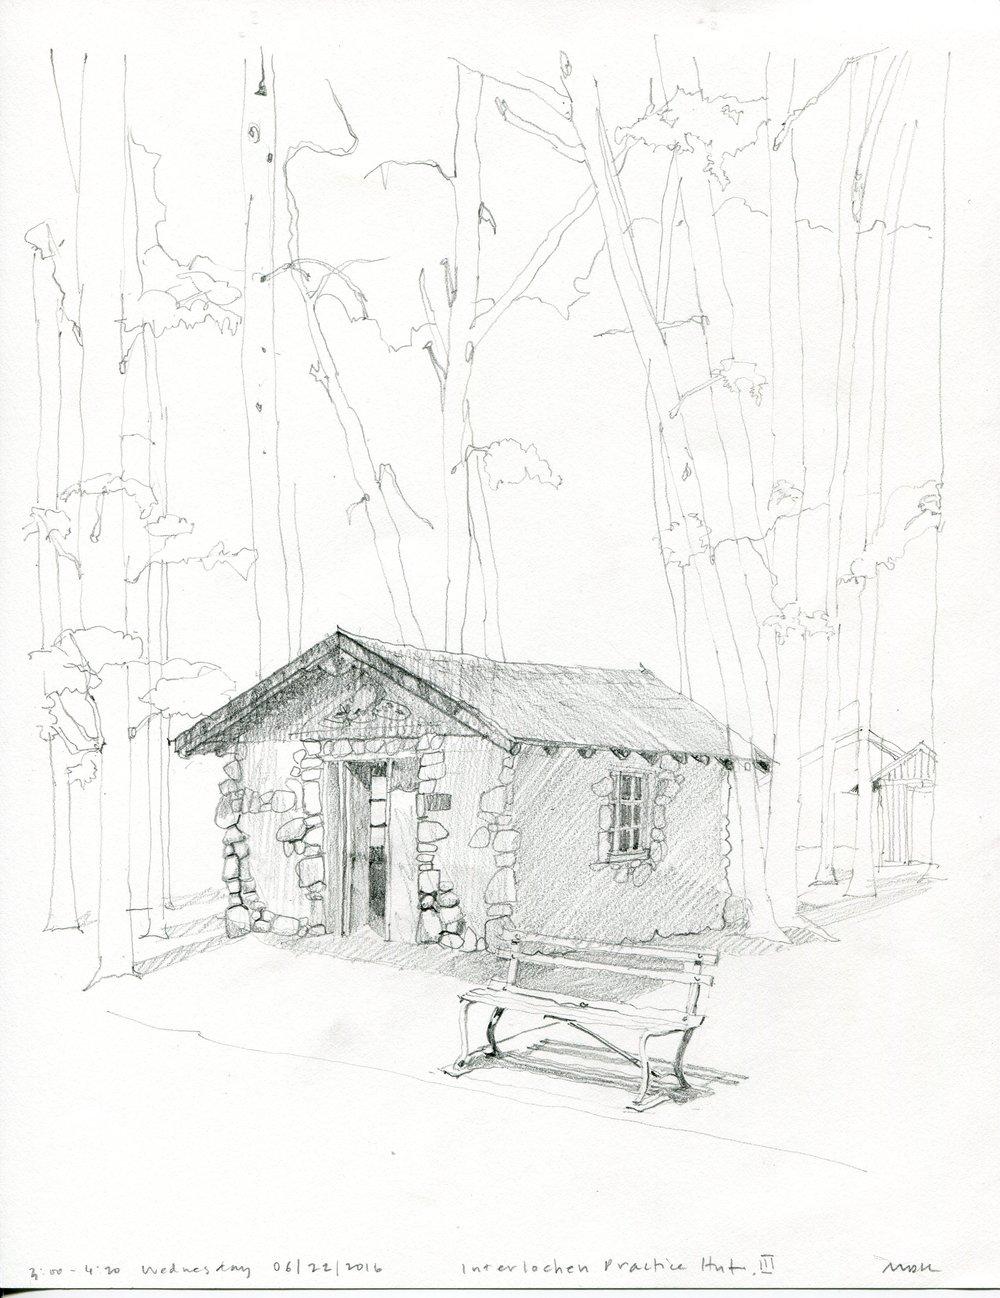 2016 Interlochen practice hut III001.jpg